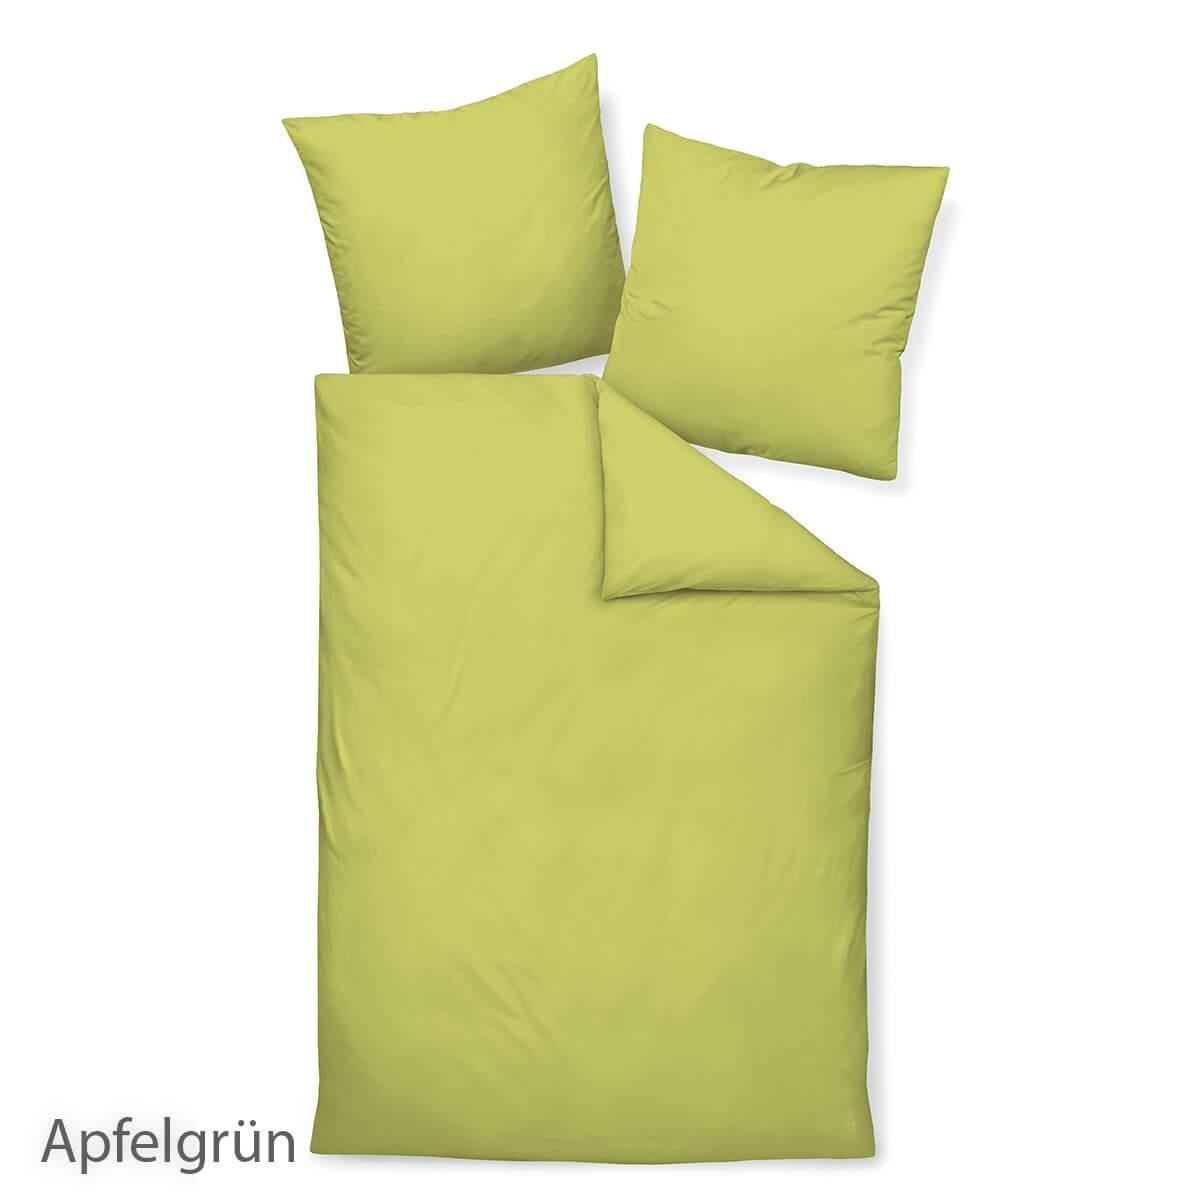 Janine Colors 31001 Bettwäsche - Apfelgrün - Grün